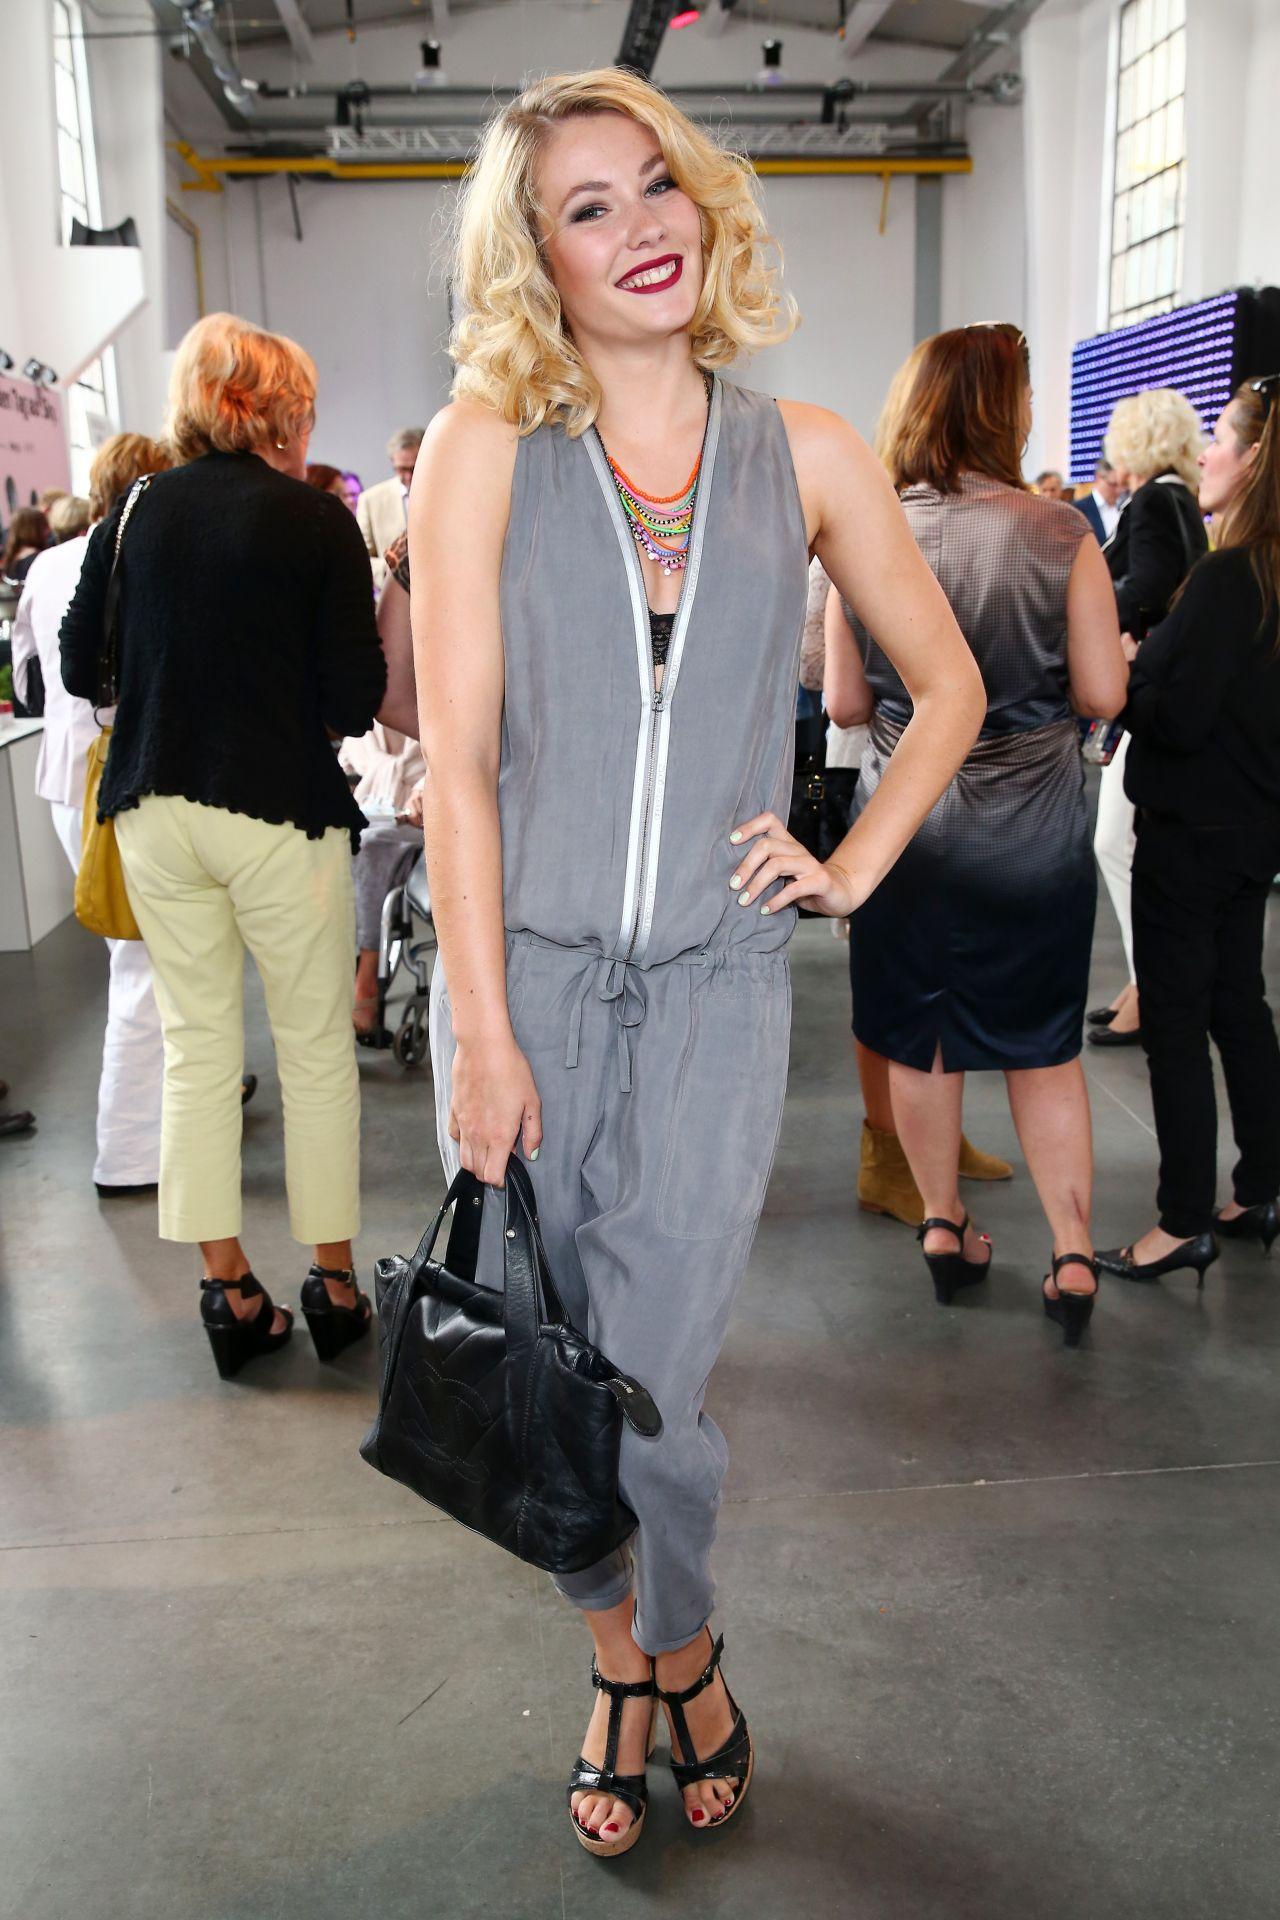 Amelie Klever – Thomas Rath Show During Platform Fashion at Areal Boehler in Düsseldorf